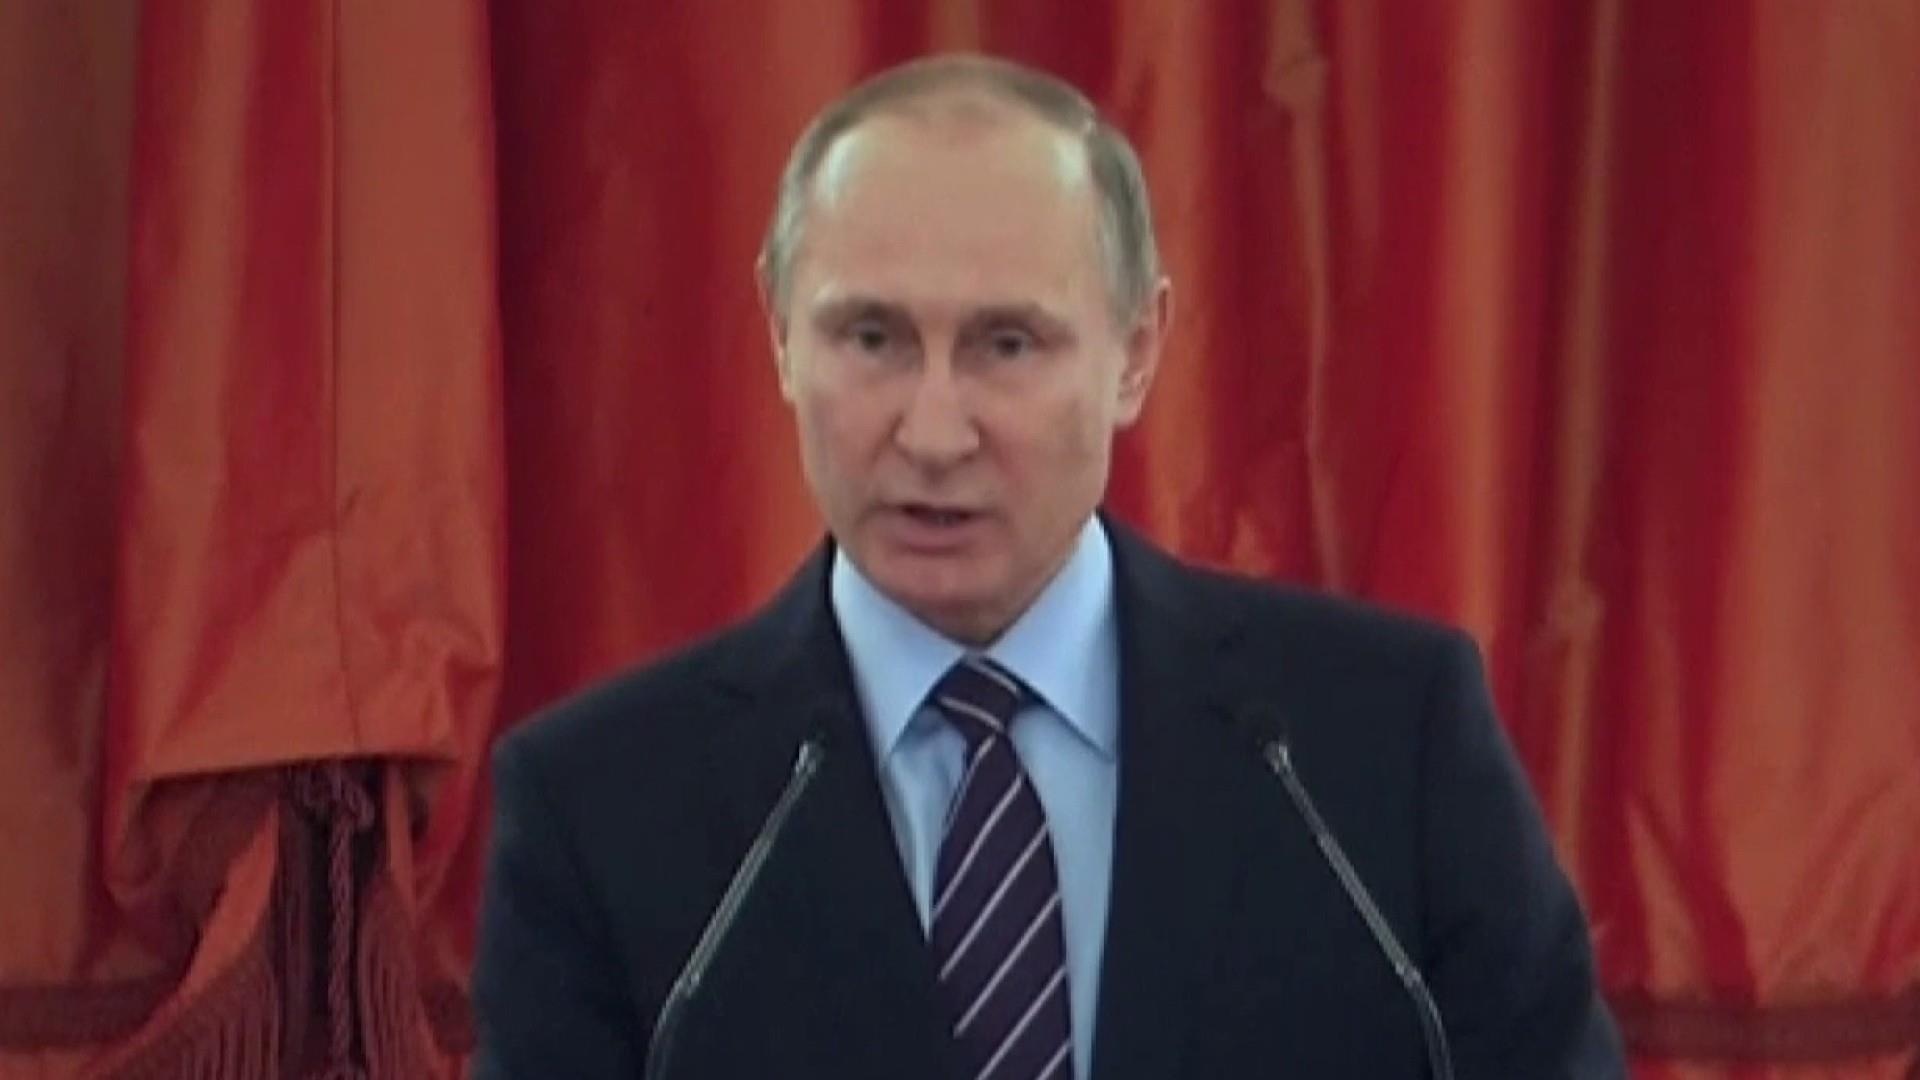 President Trump cancels G20 meeting with Vladimir Putin